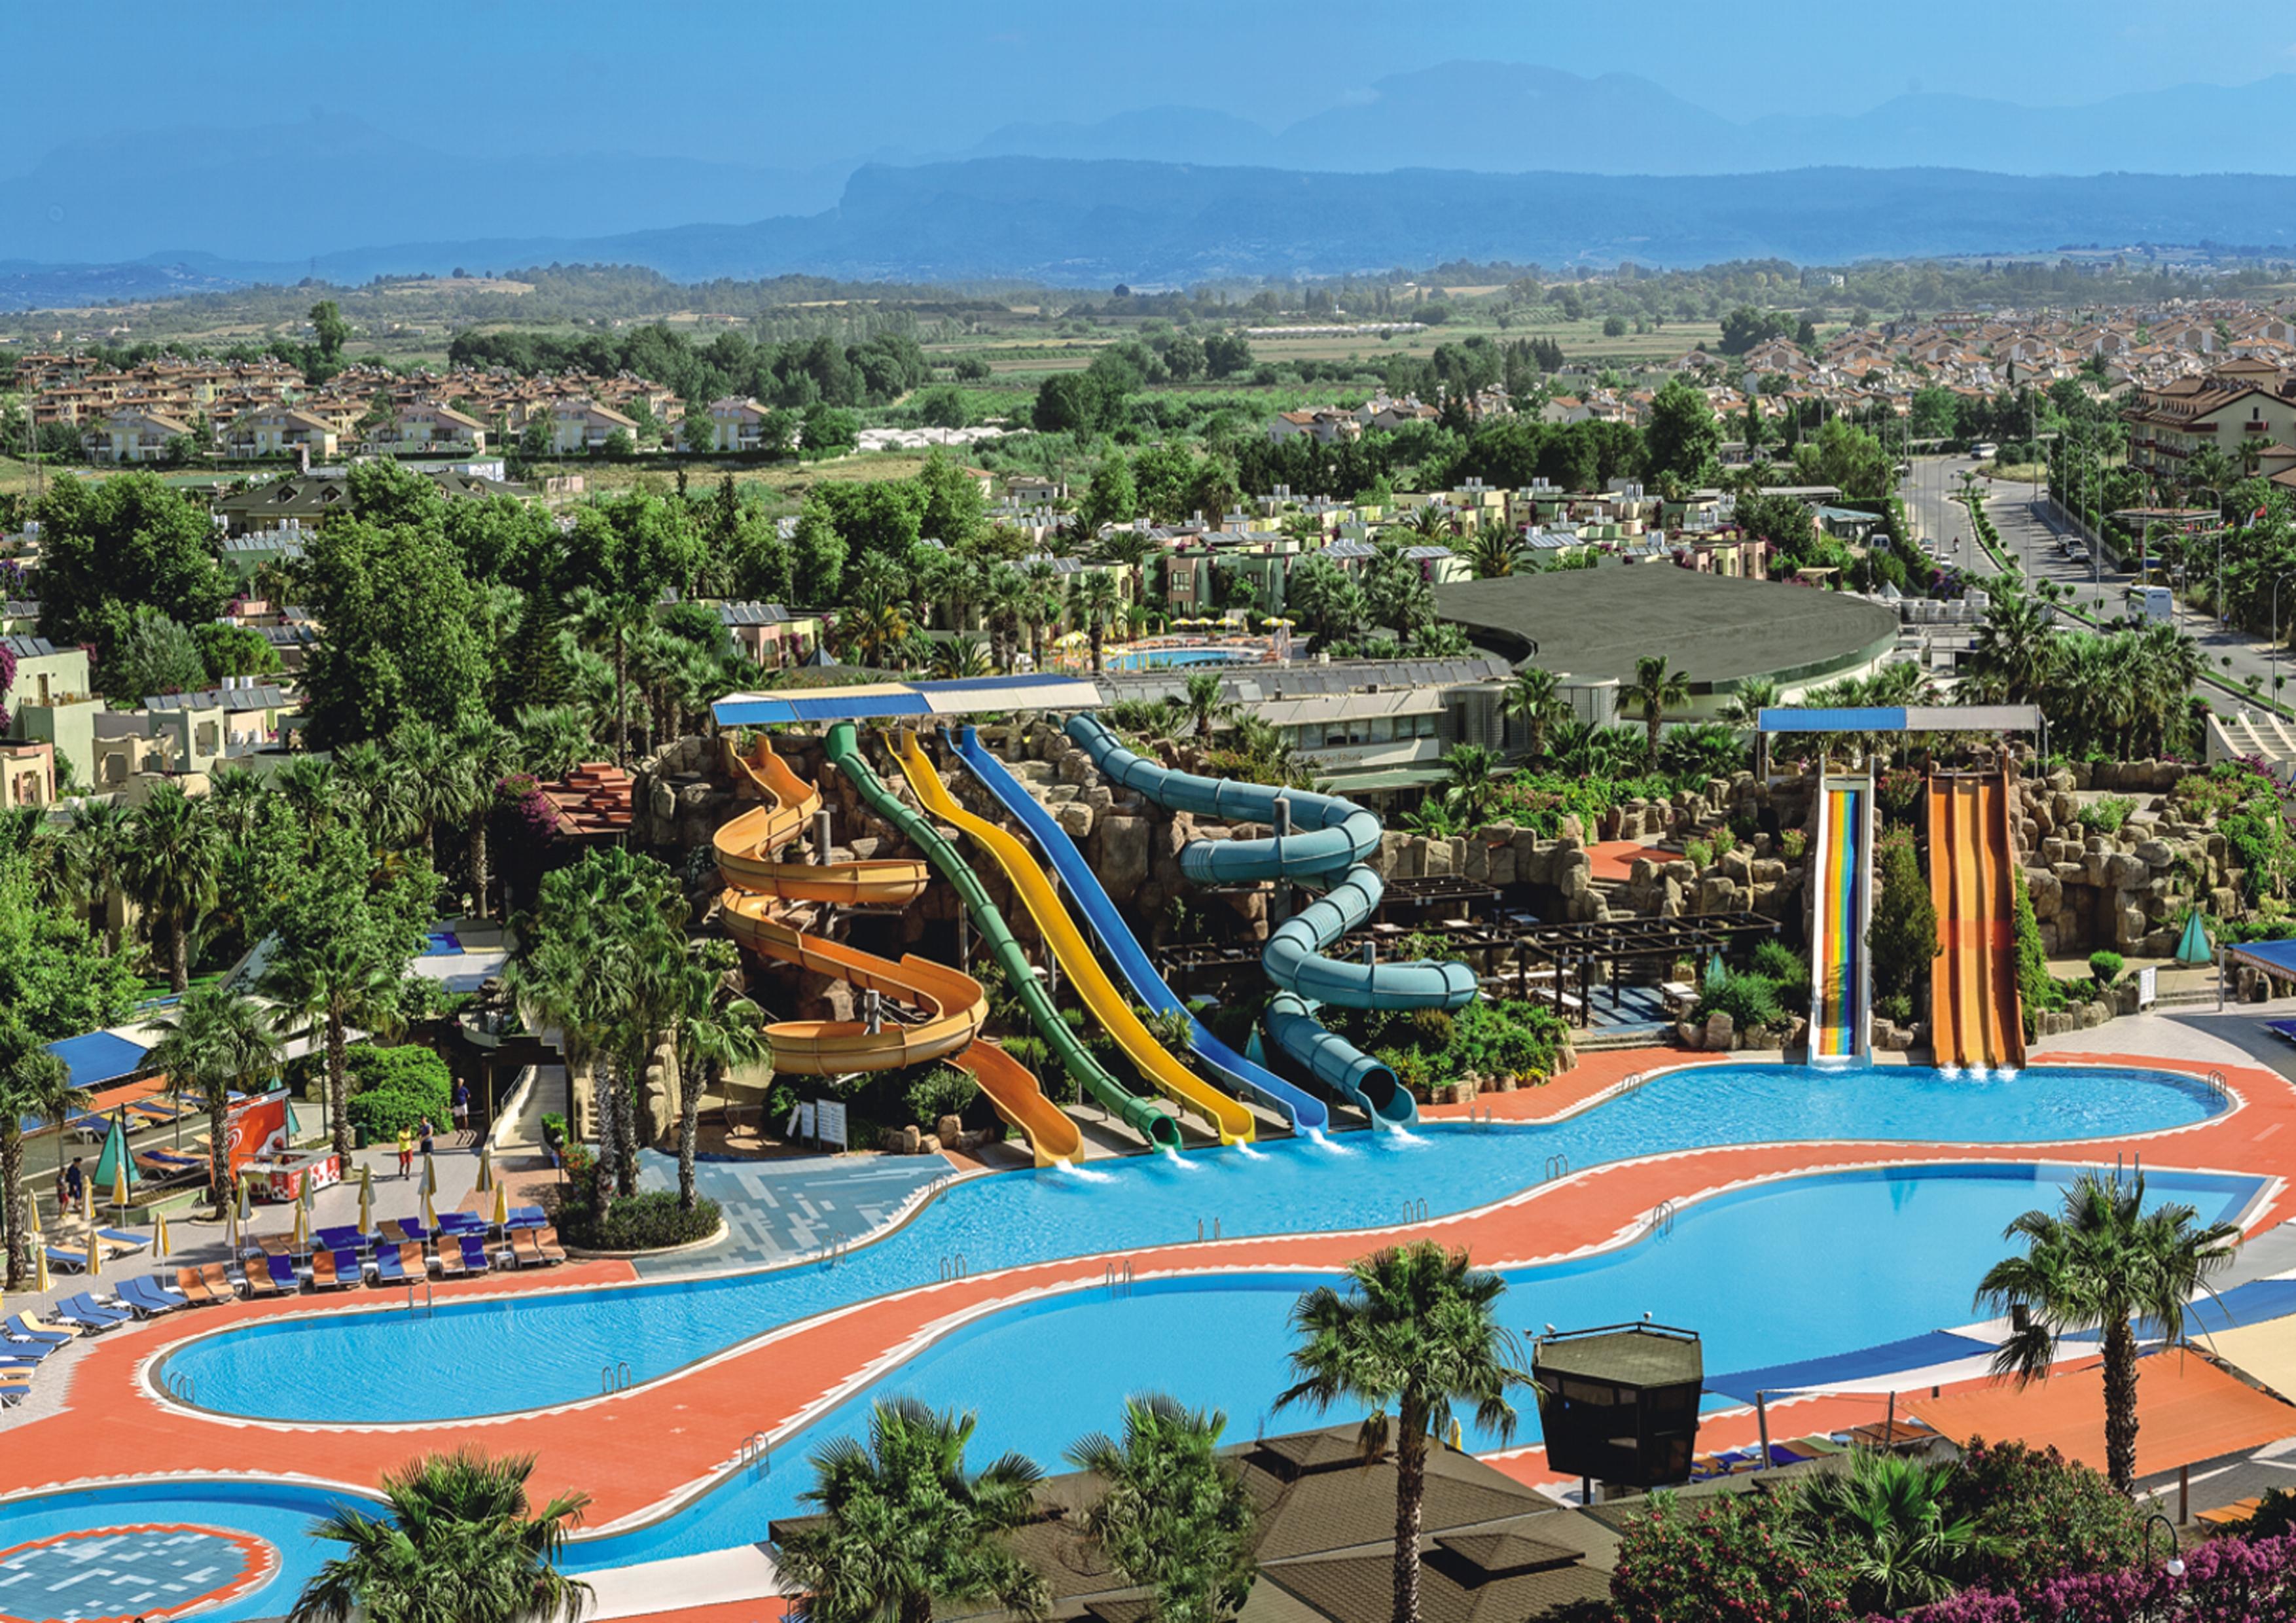 На территории Golden Beach расположен аквапарк с 13 горками